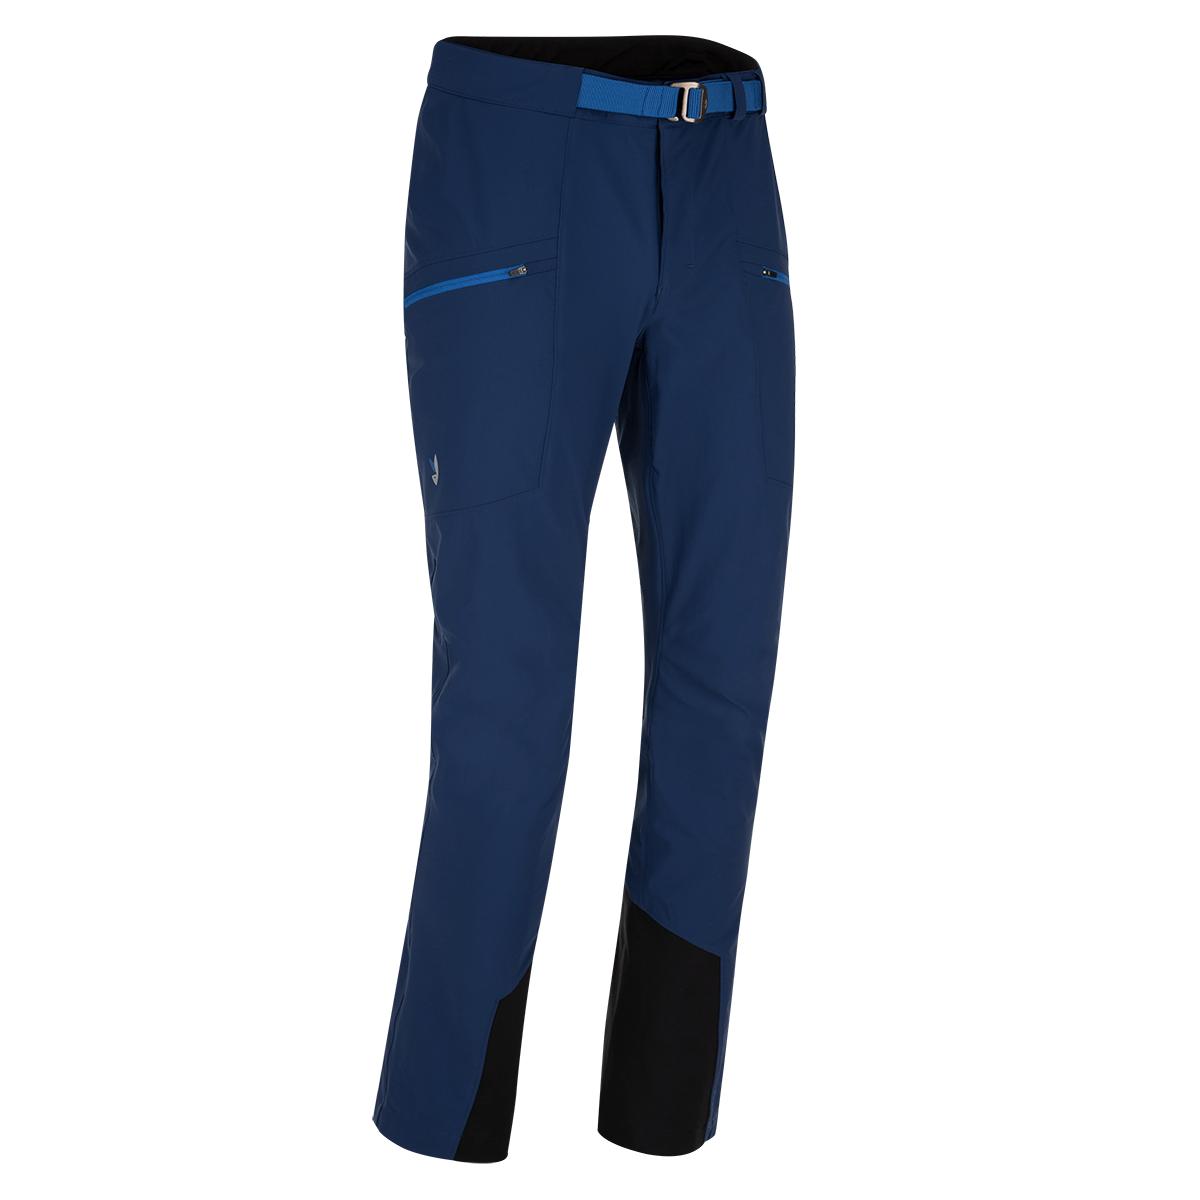 Nohavice Zajo Air LT Neo Pants